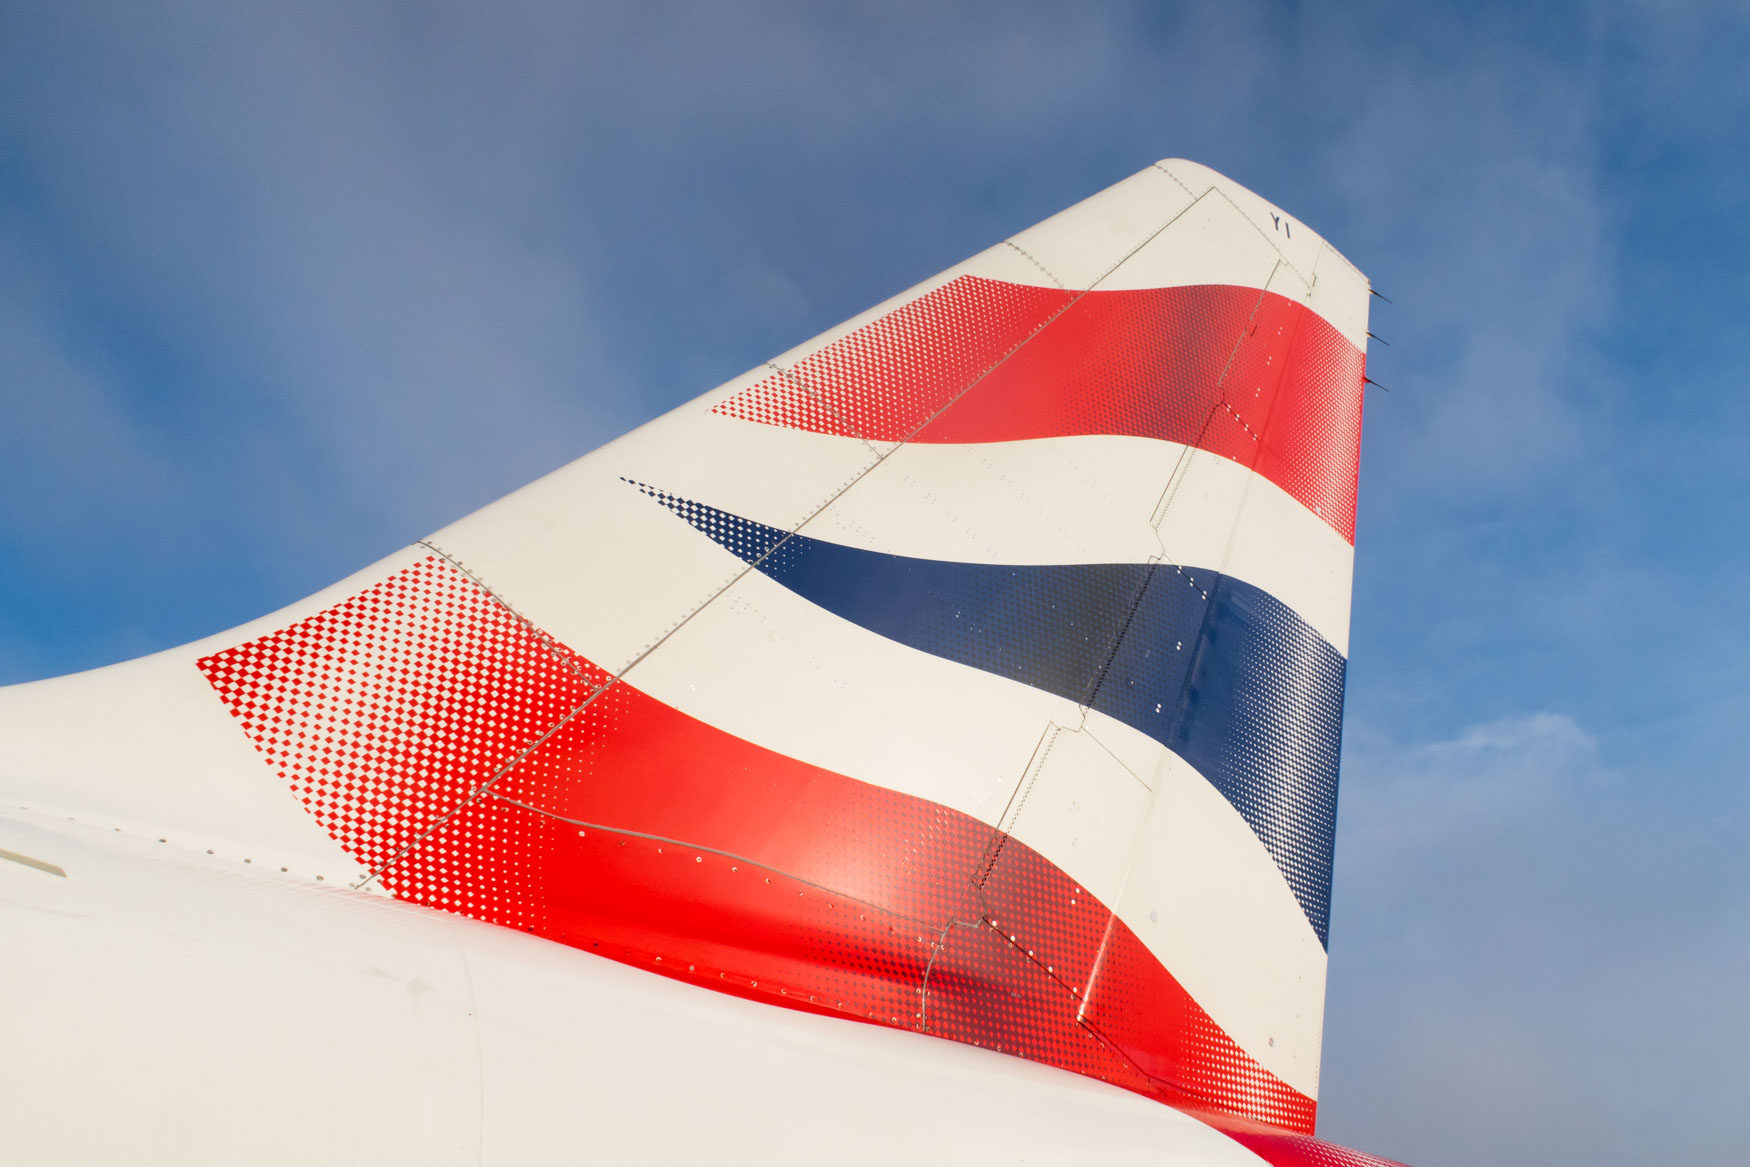 British Airways Airbus A320 Tail